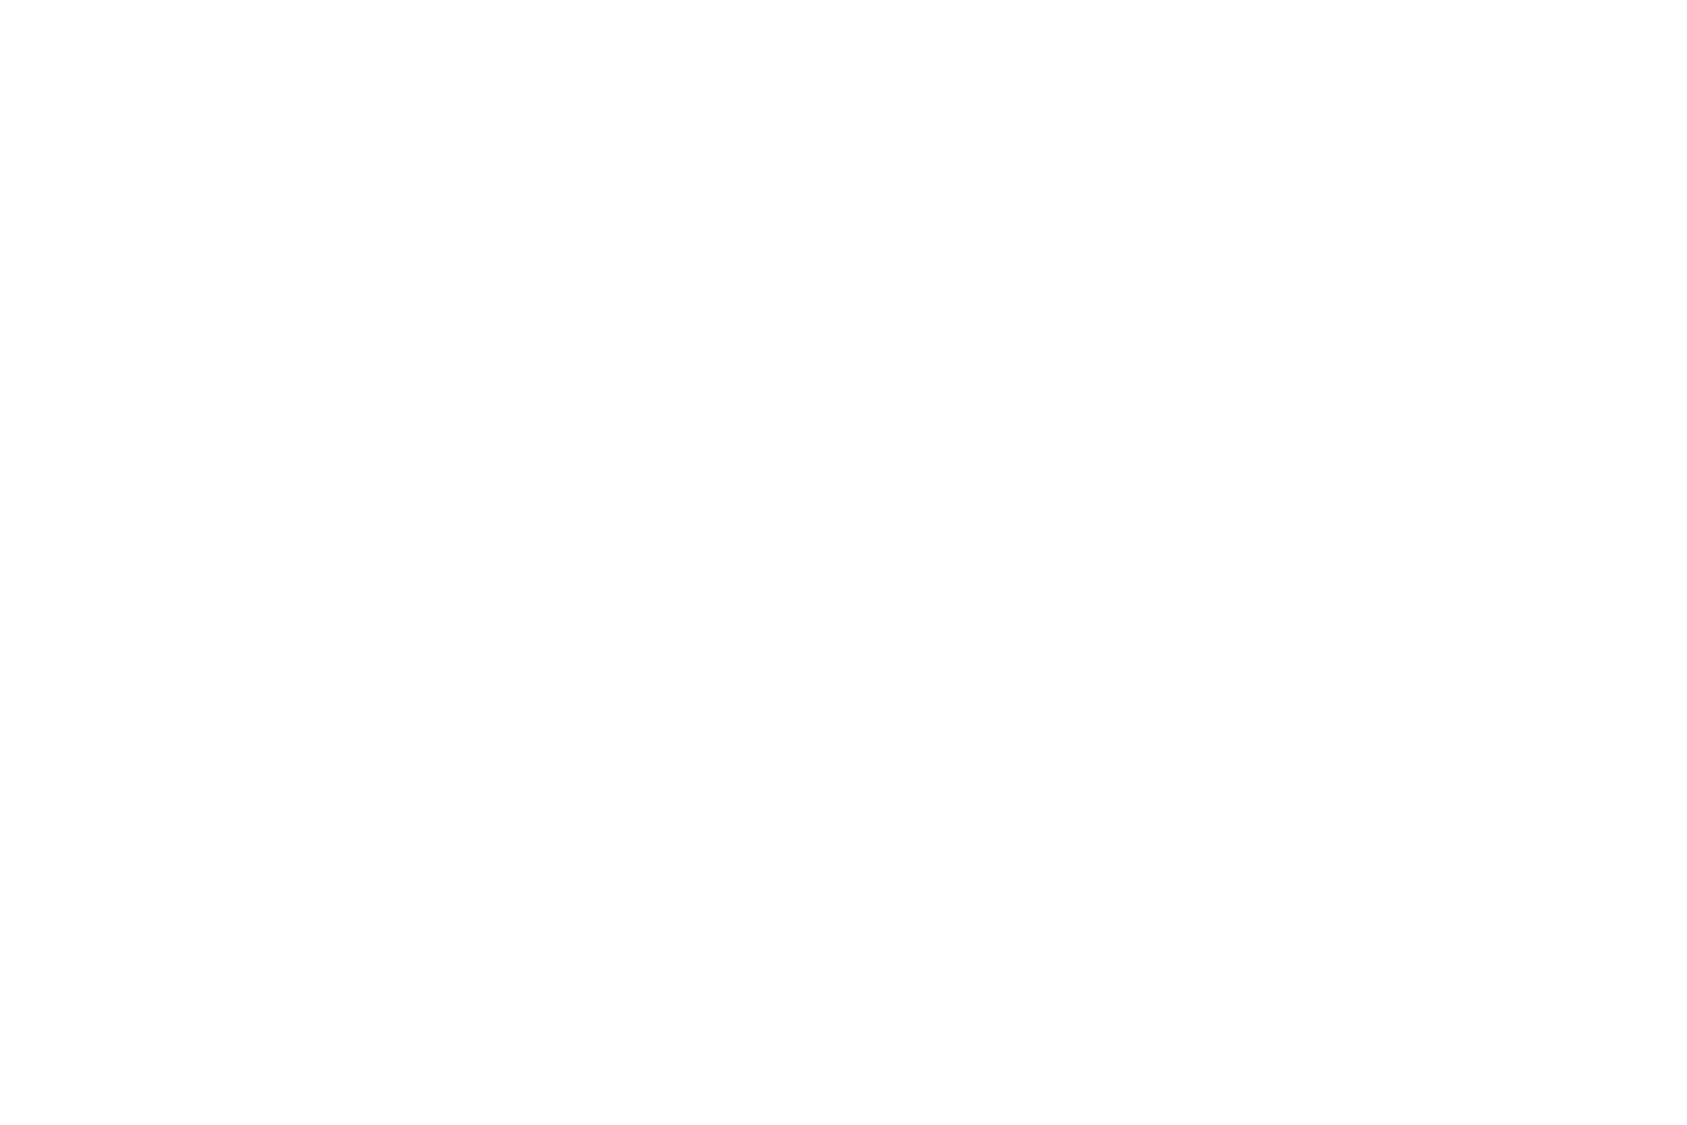 Vc studios_White logo